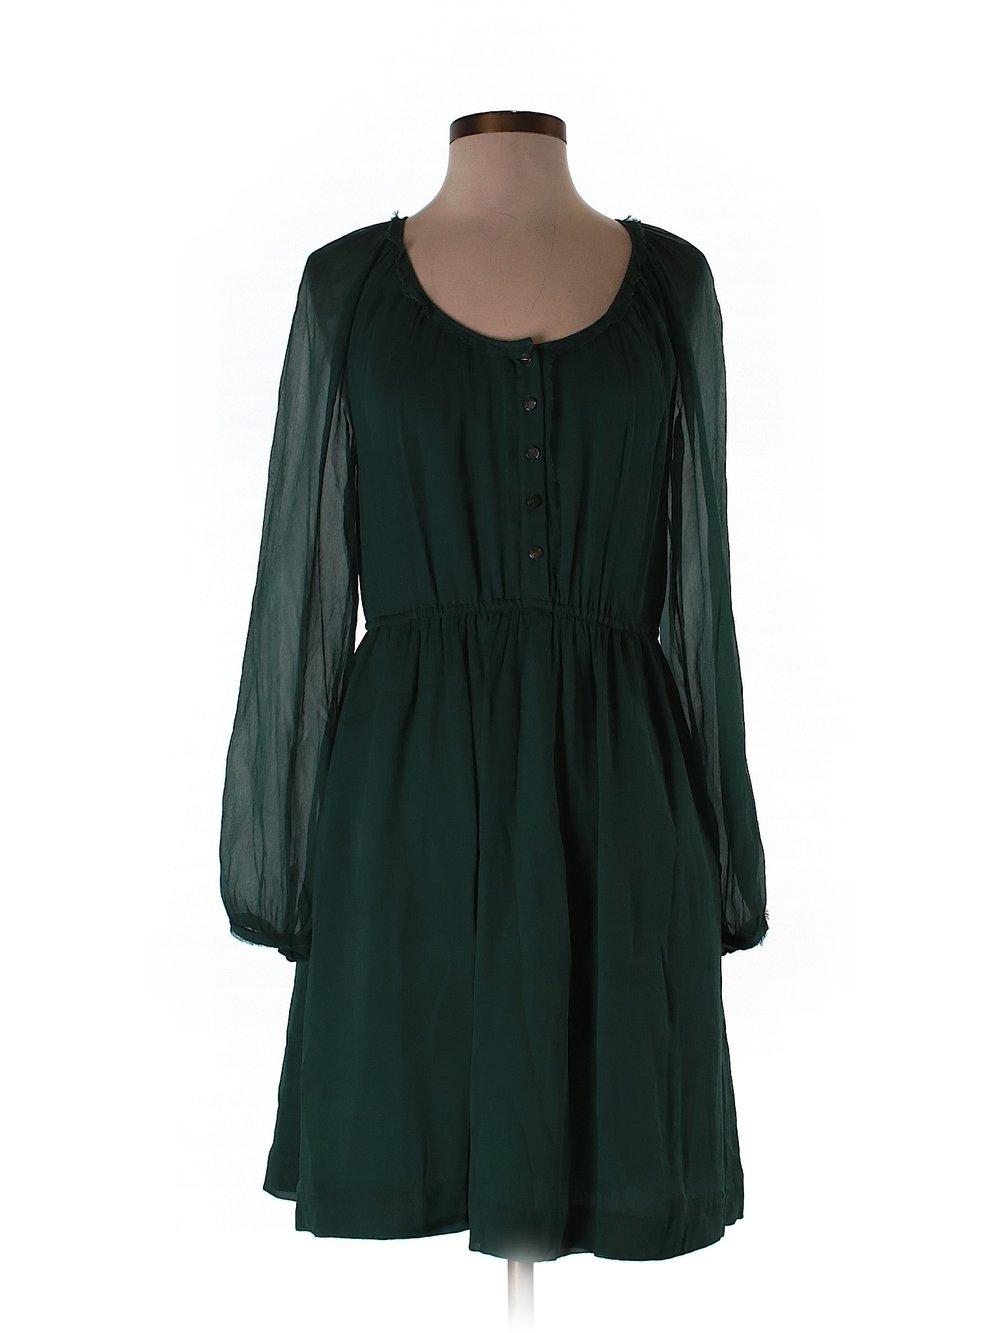 Eliot - Grünes Seiden-Kleid :: Kleiderkorb.de